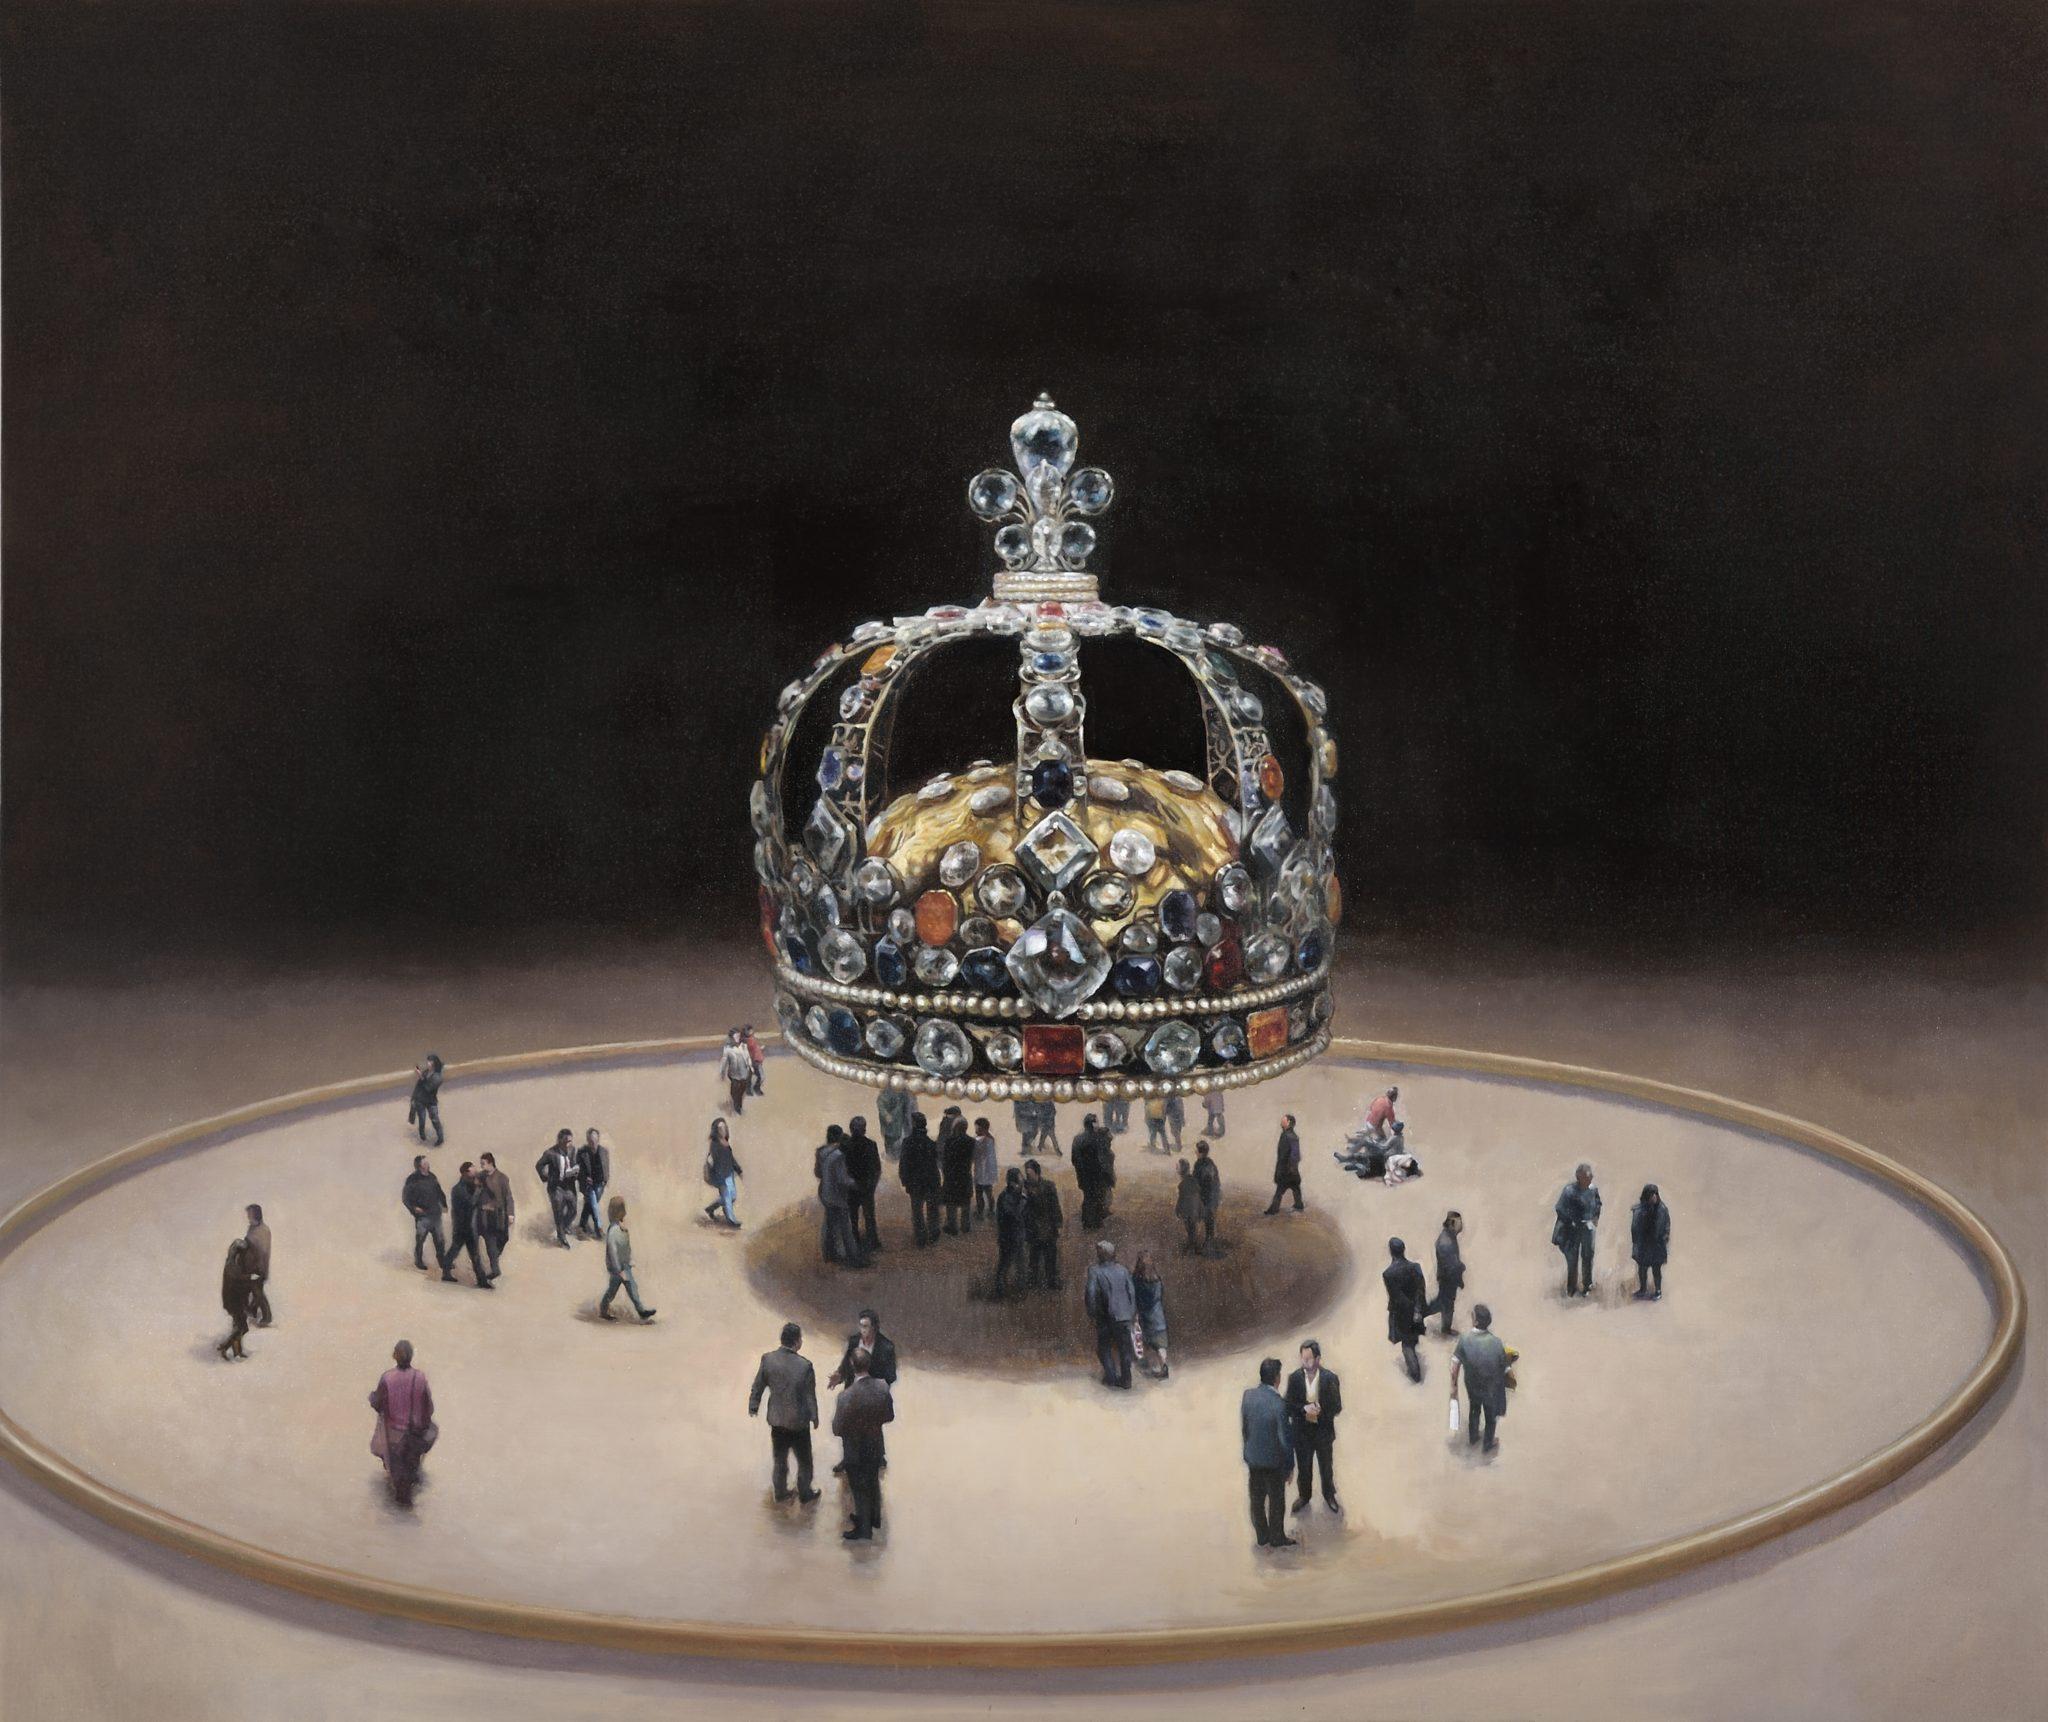 France, Paris, Reproductions de peintures de Xiao Fan Ru